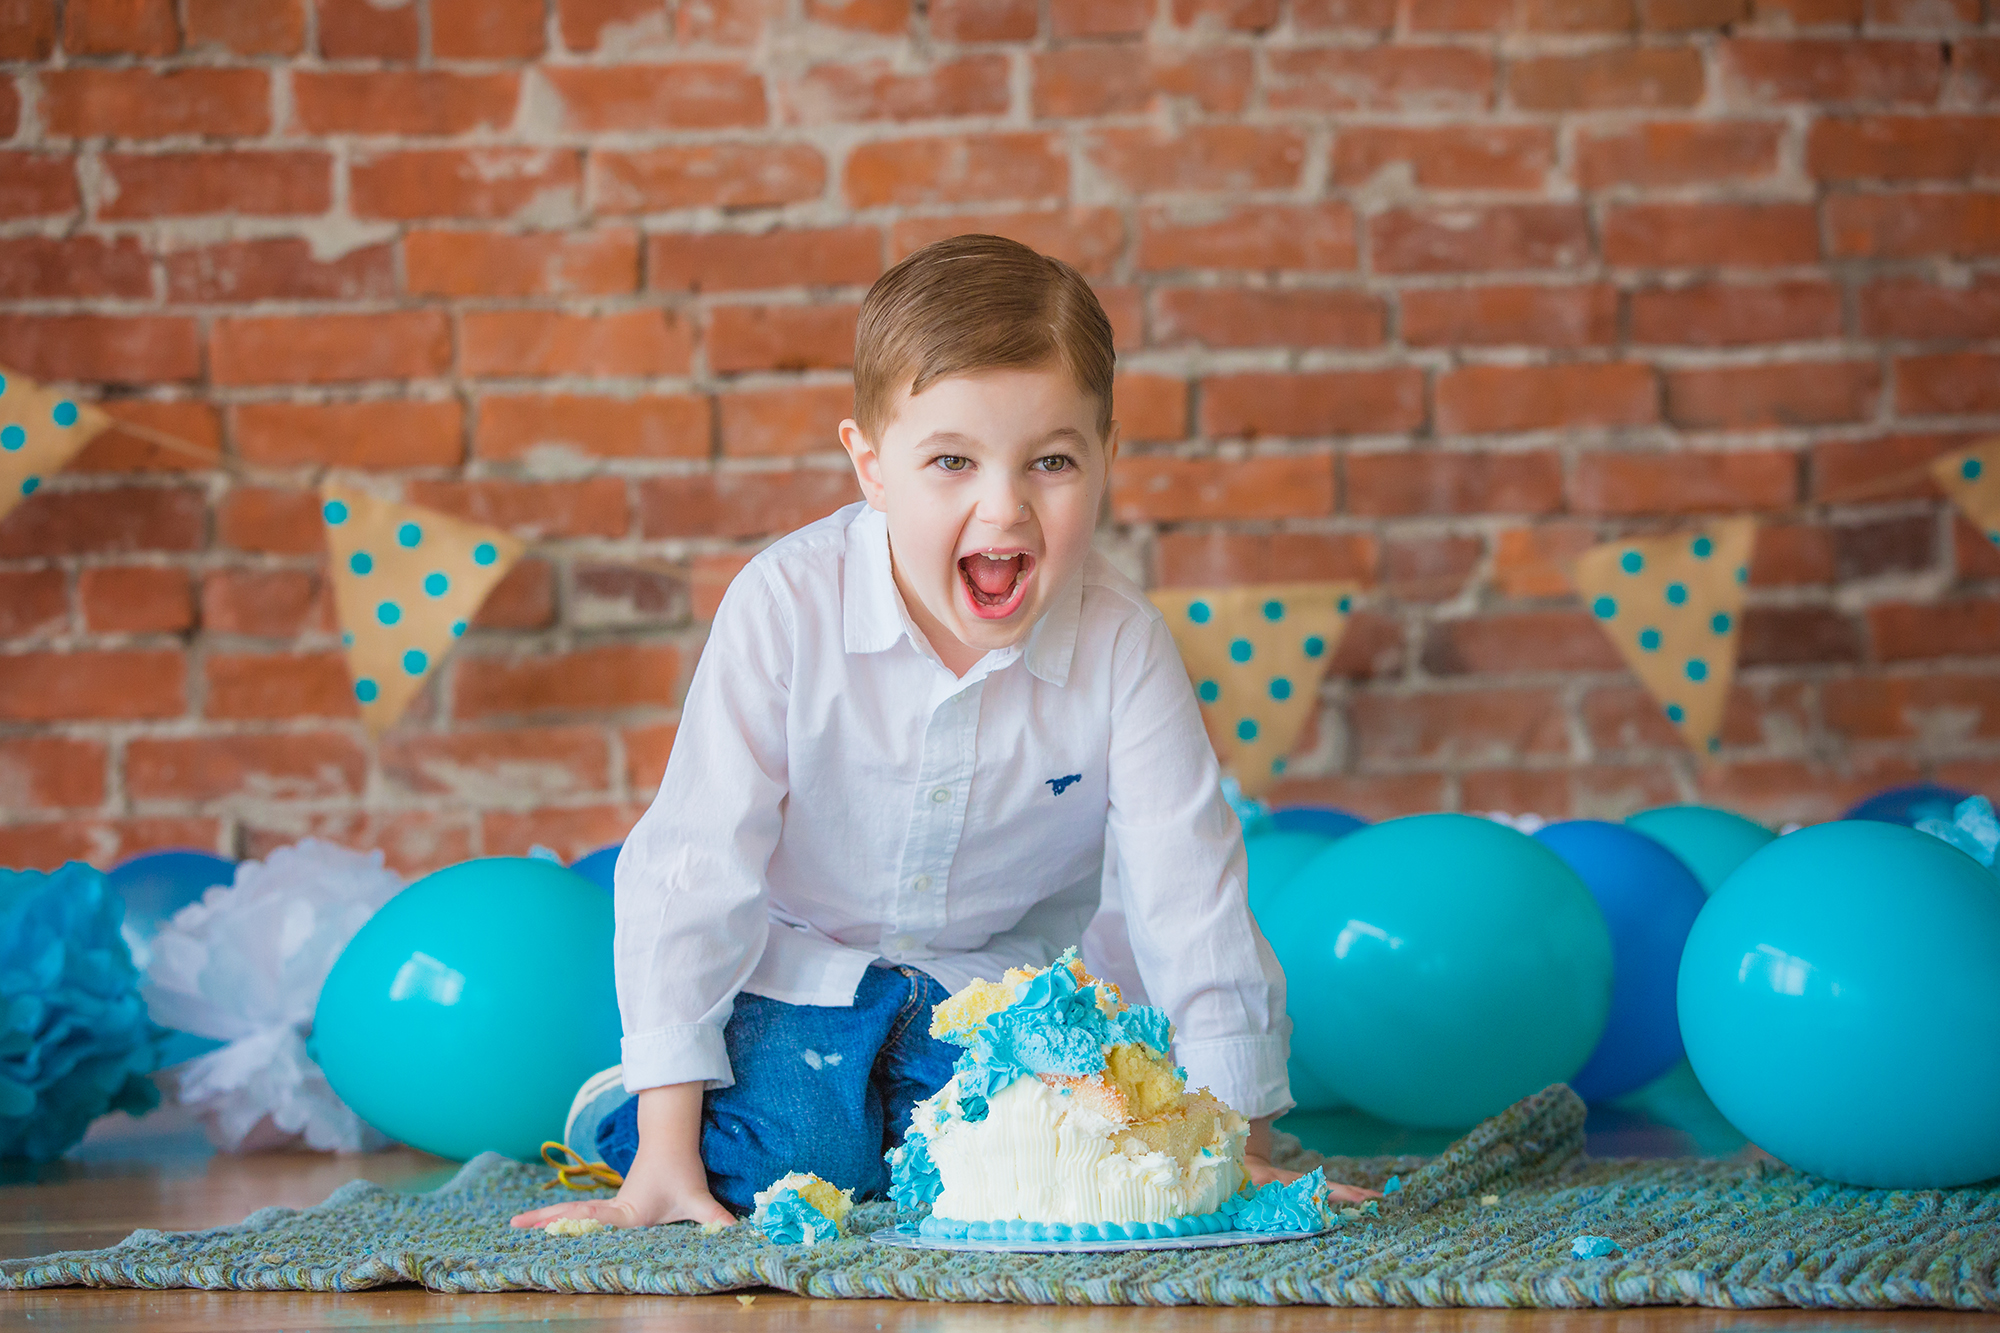 Big brother smashes cake